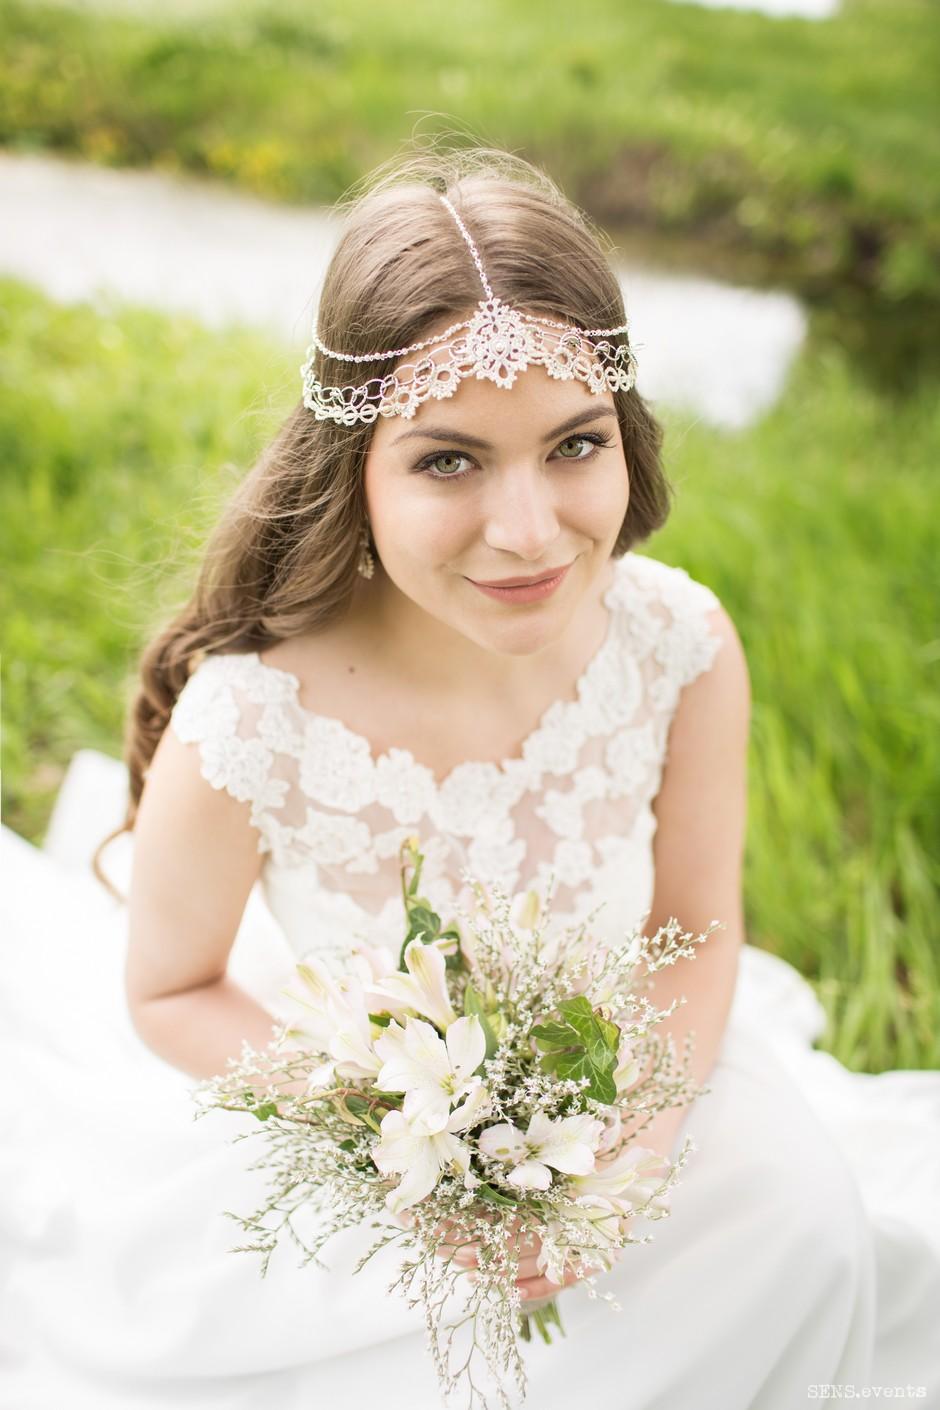 Sens_events_couple_2_Ionela_Sergiu-038